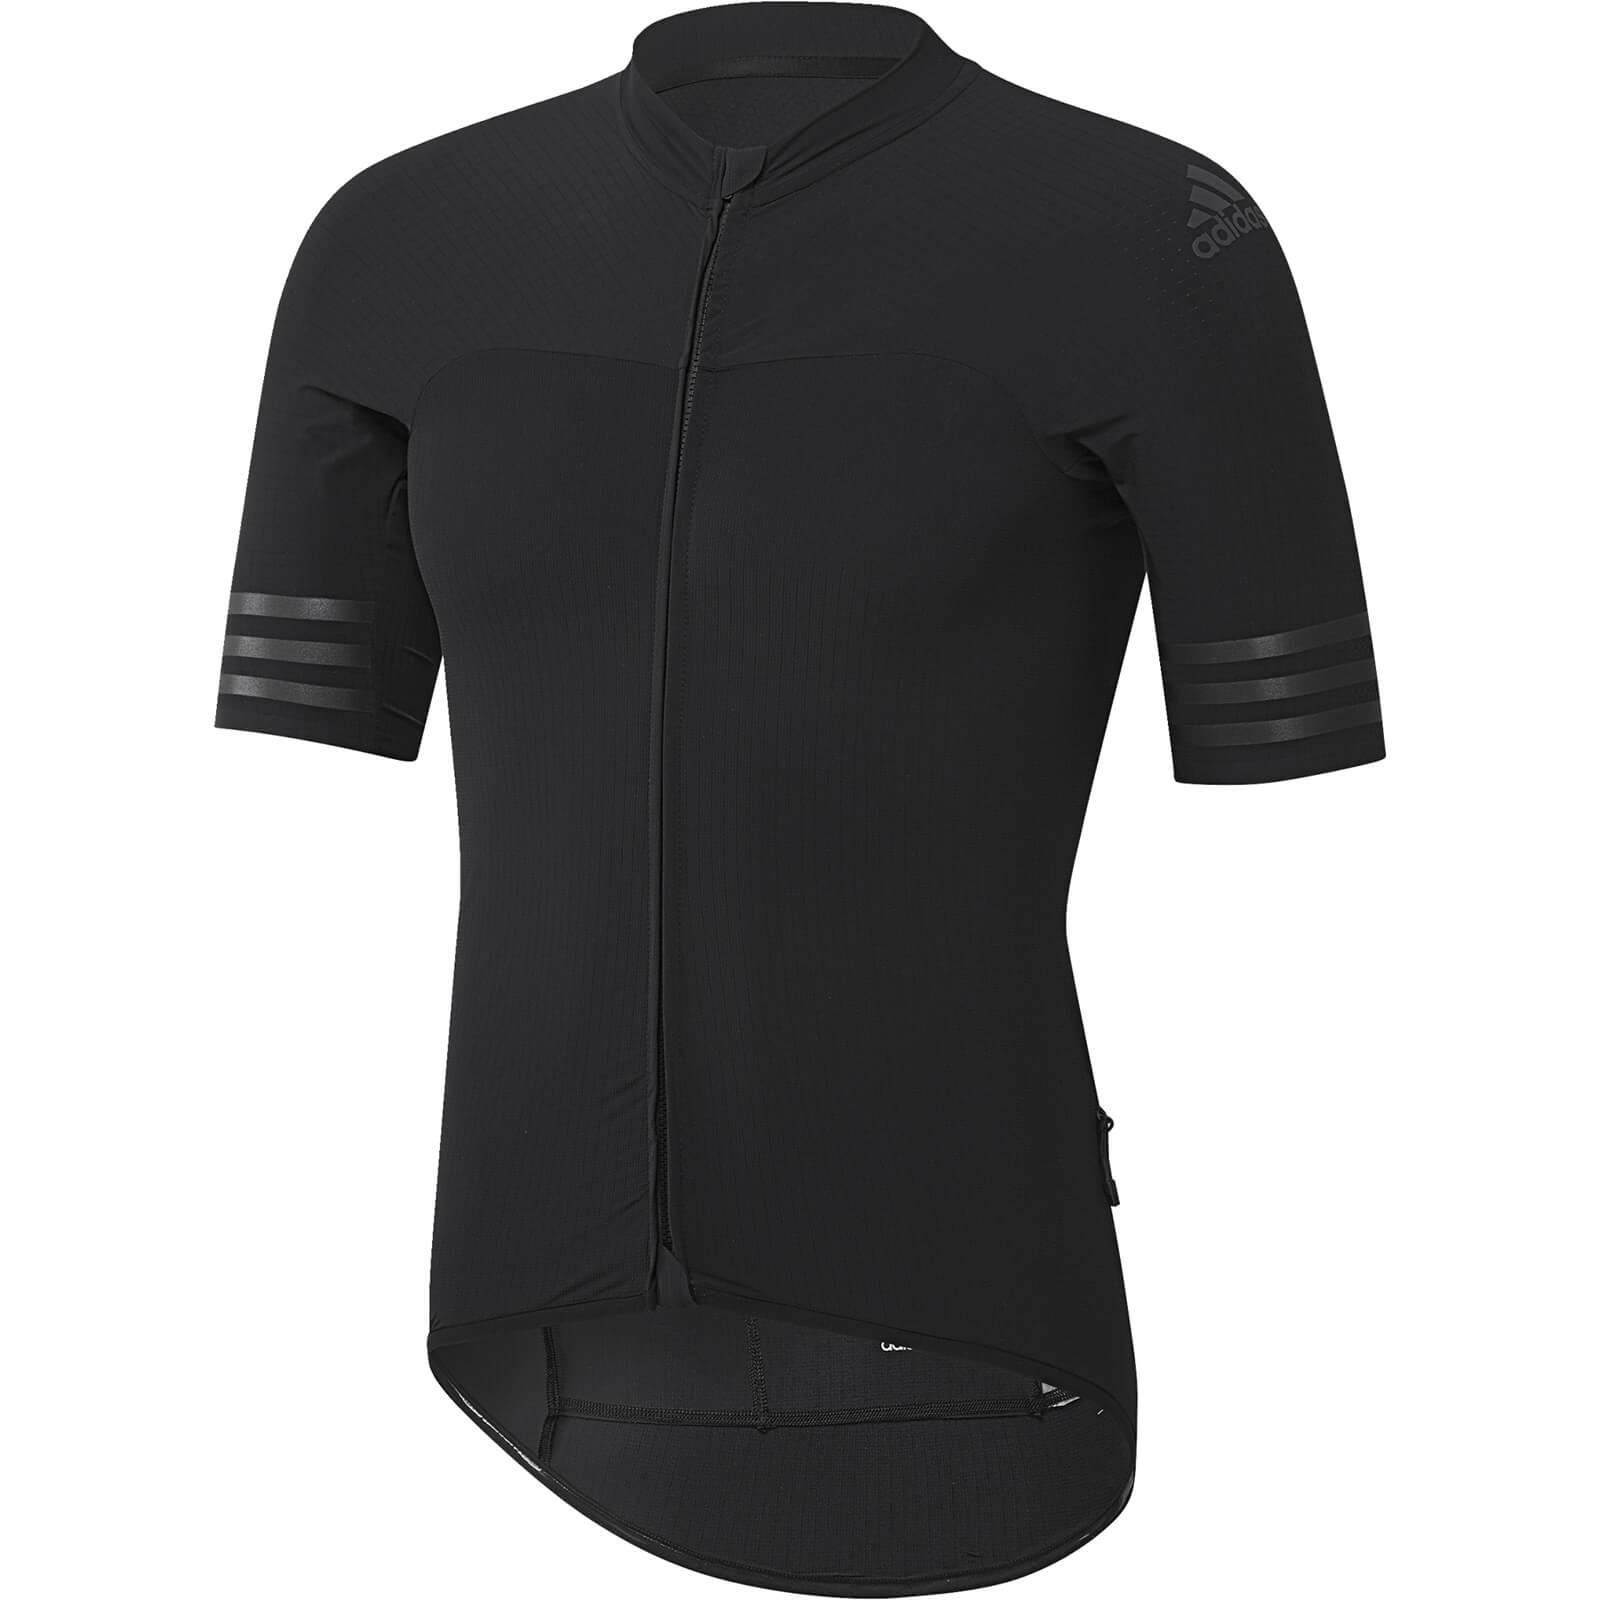 adidas Women's Adistar Cycling Jersey - Black - S